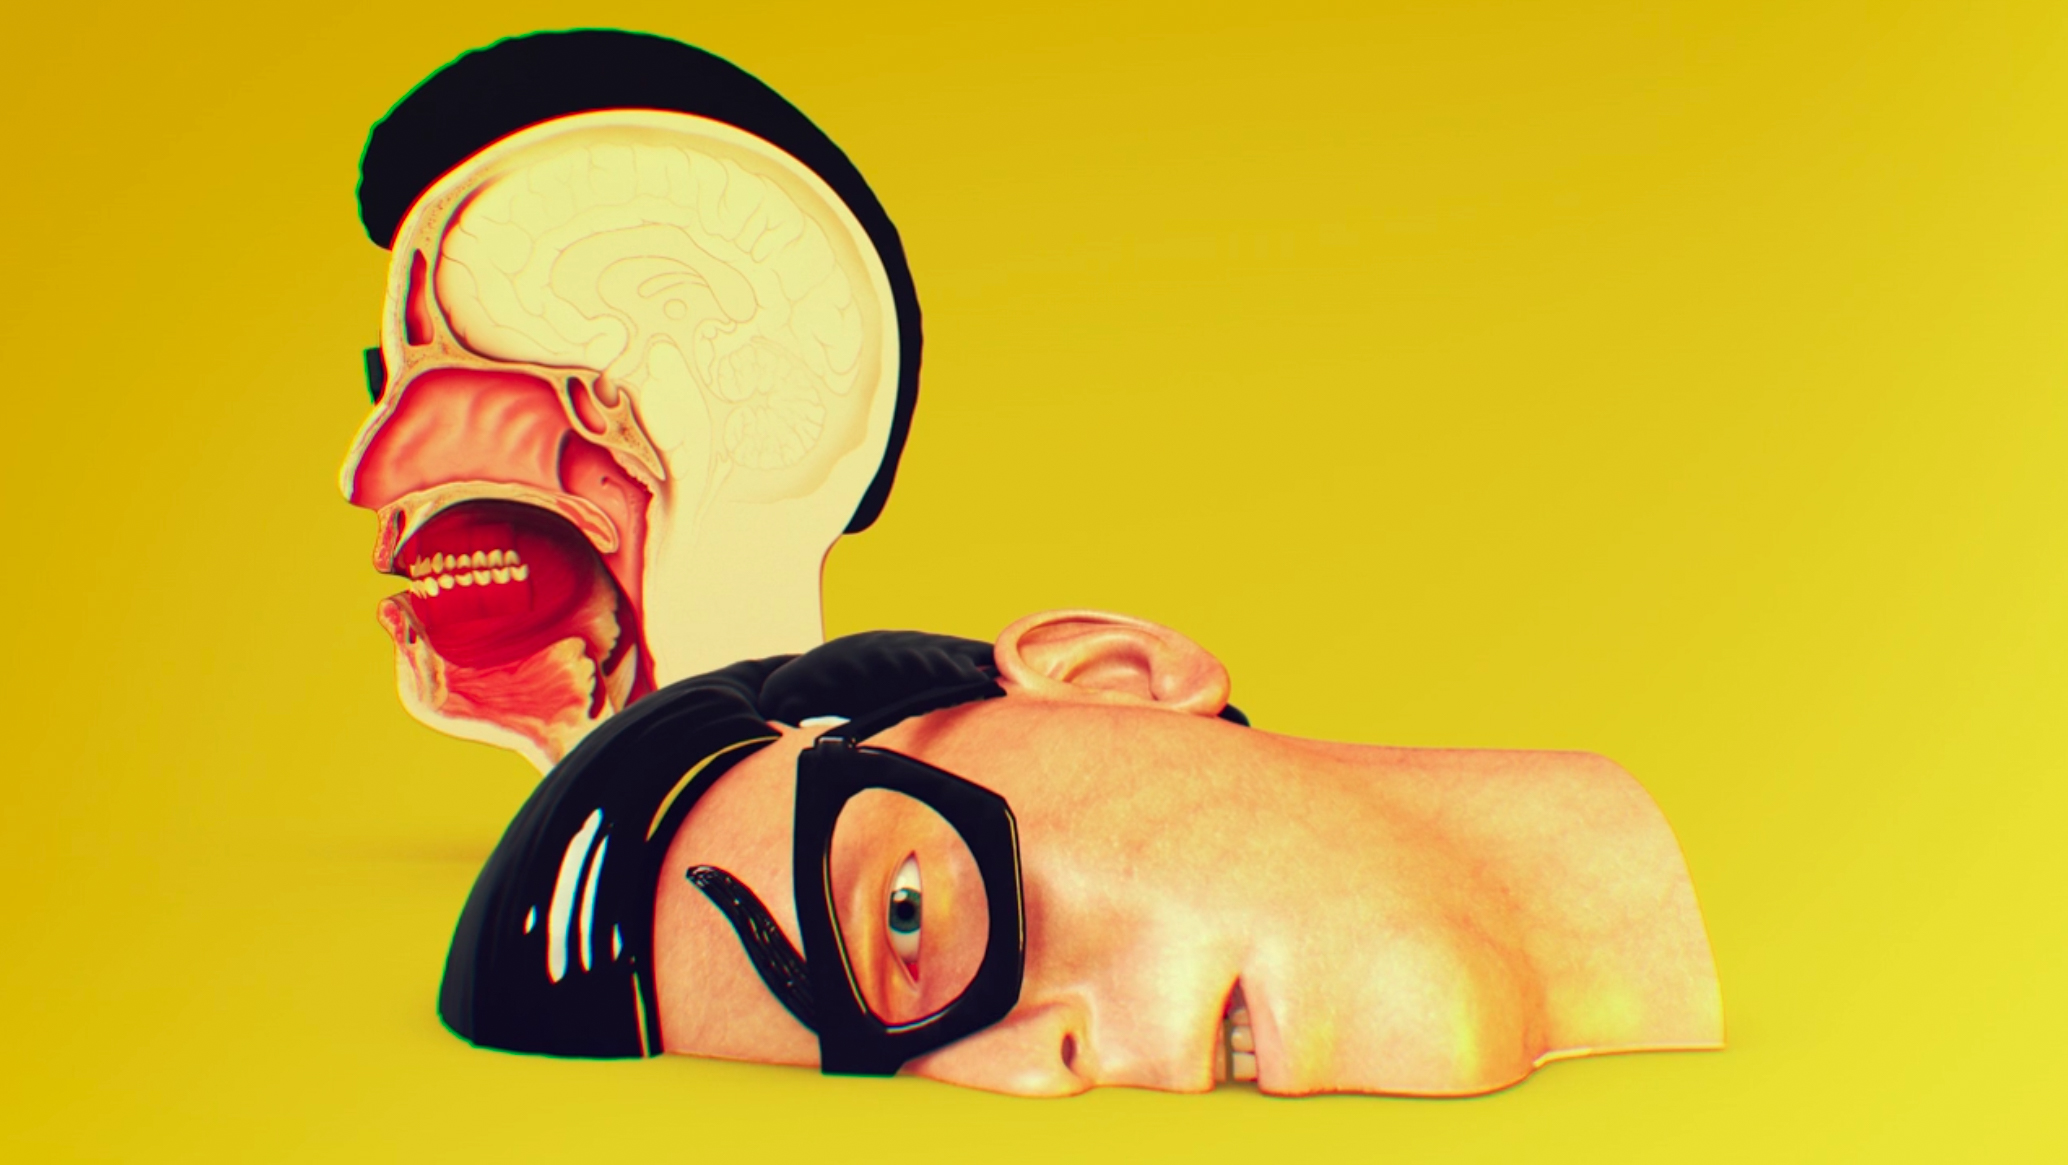 Promax / Videophonic | Gut Feeling